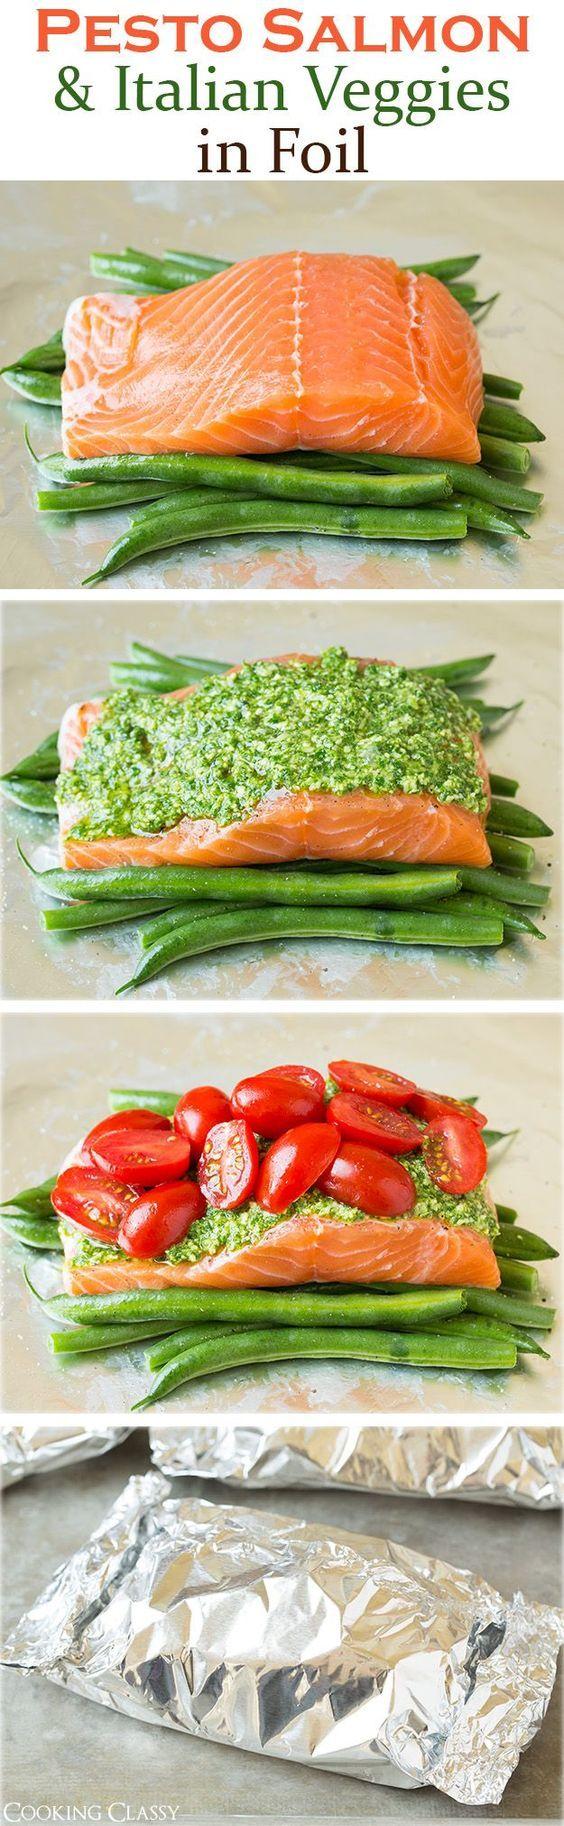 Pesto Salmon and Italian Veggies in Foil Recipe plus 24 more of the most pinned fish recipes